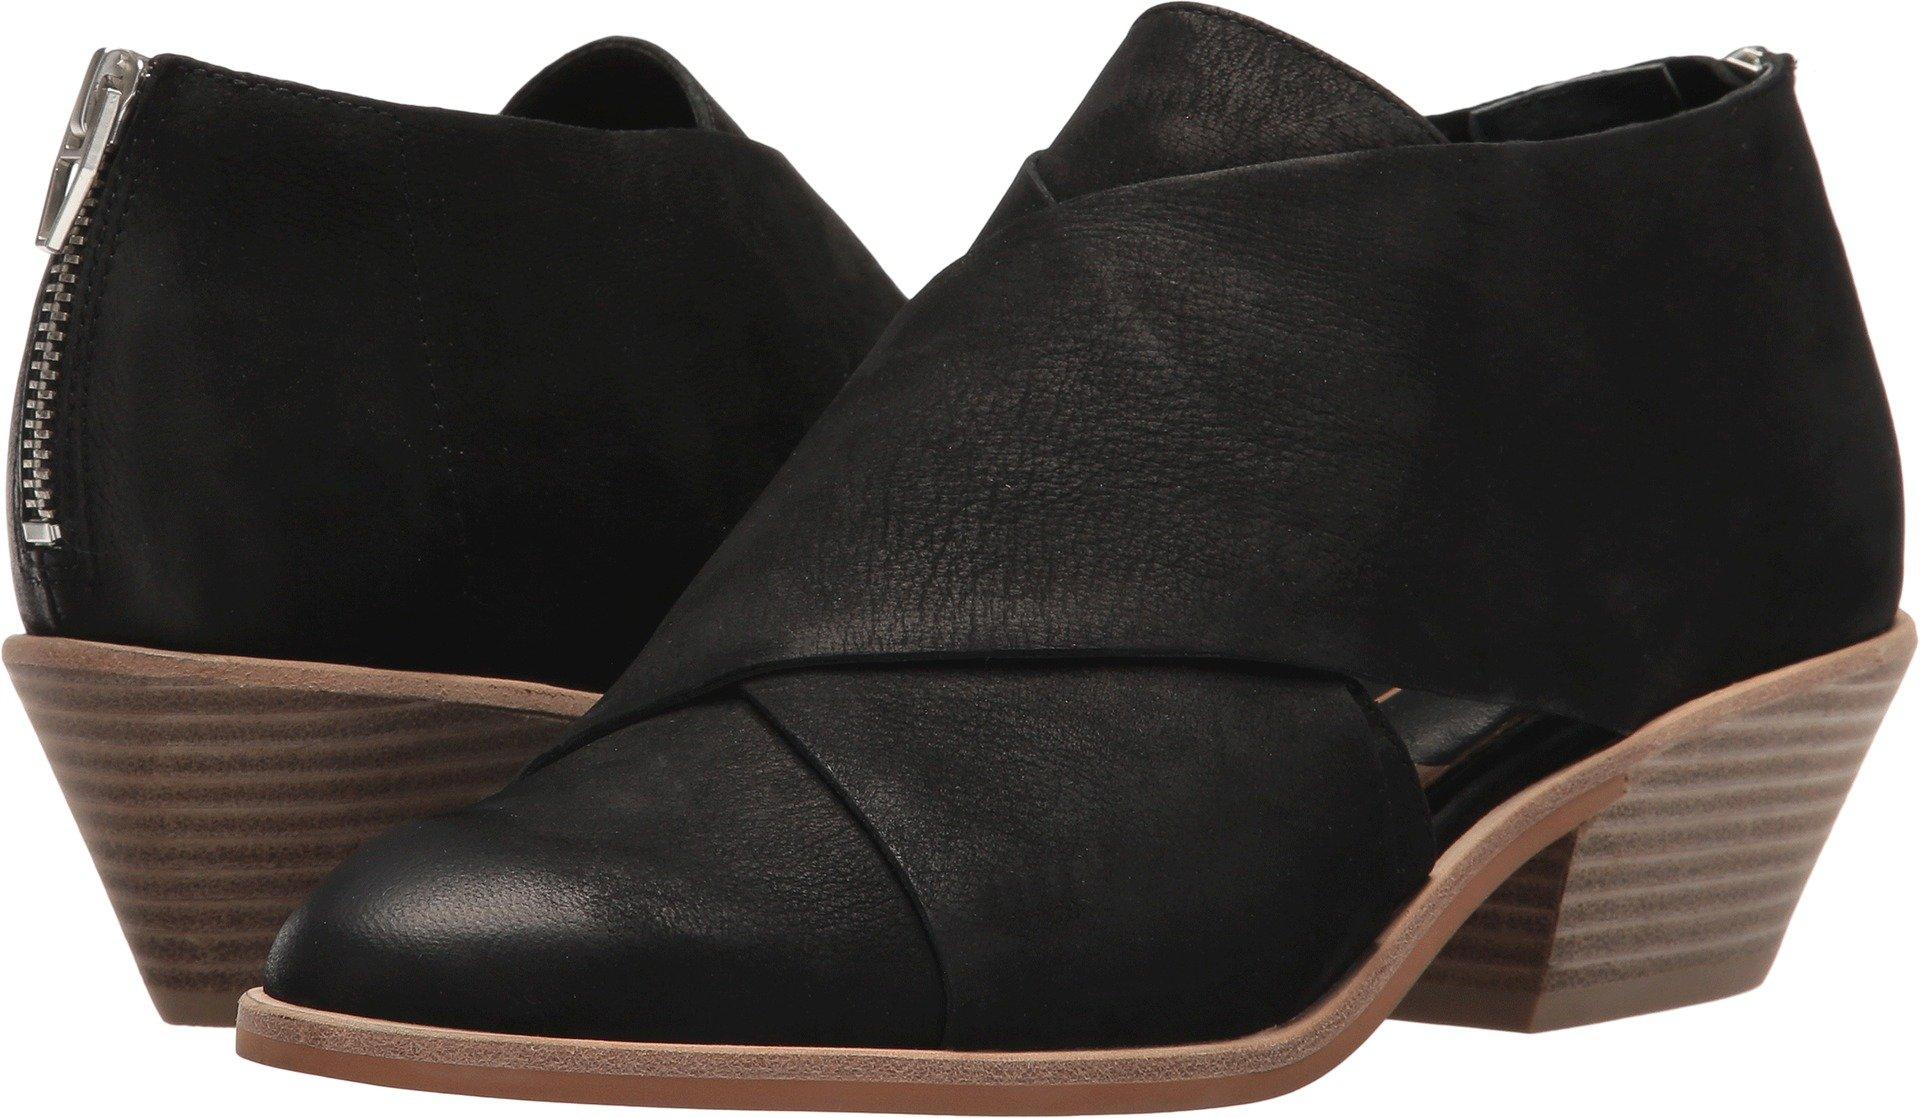 Dolce Vita Women's Loida Ankle Boot, Black Nubuck, 6 M US